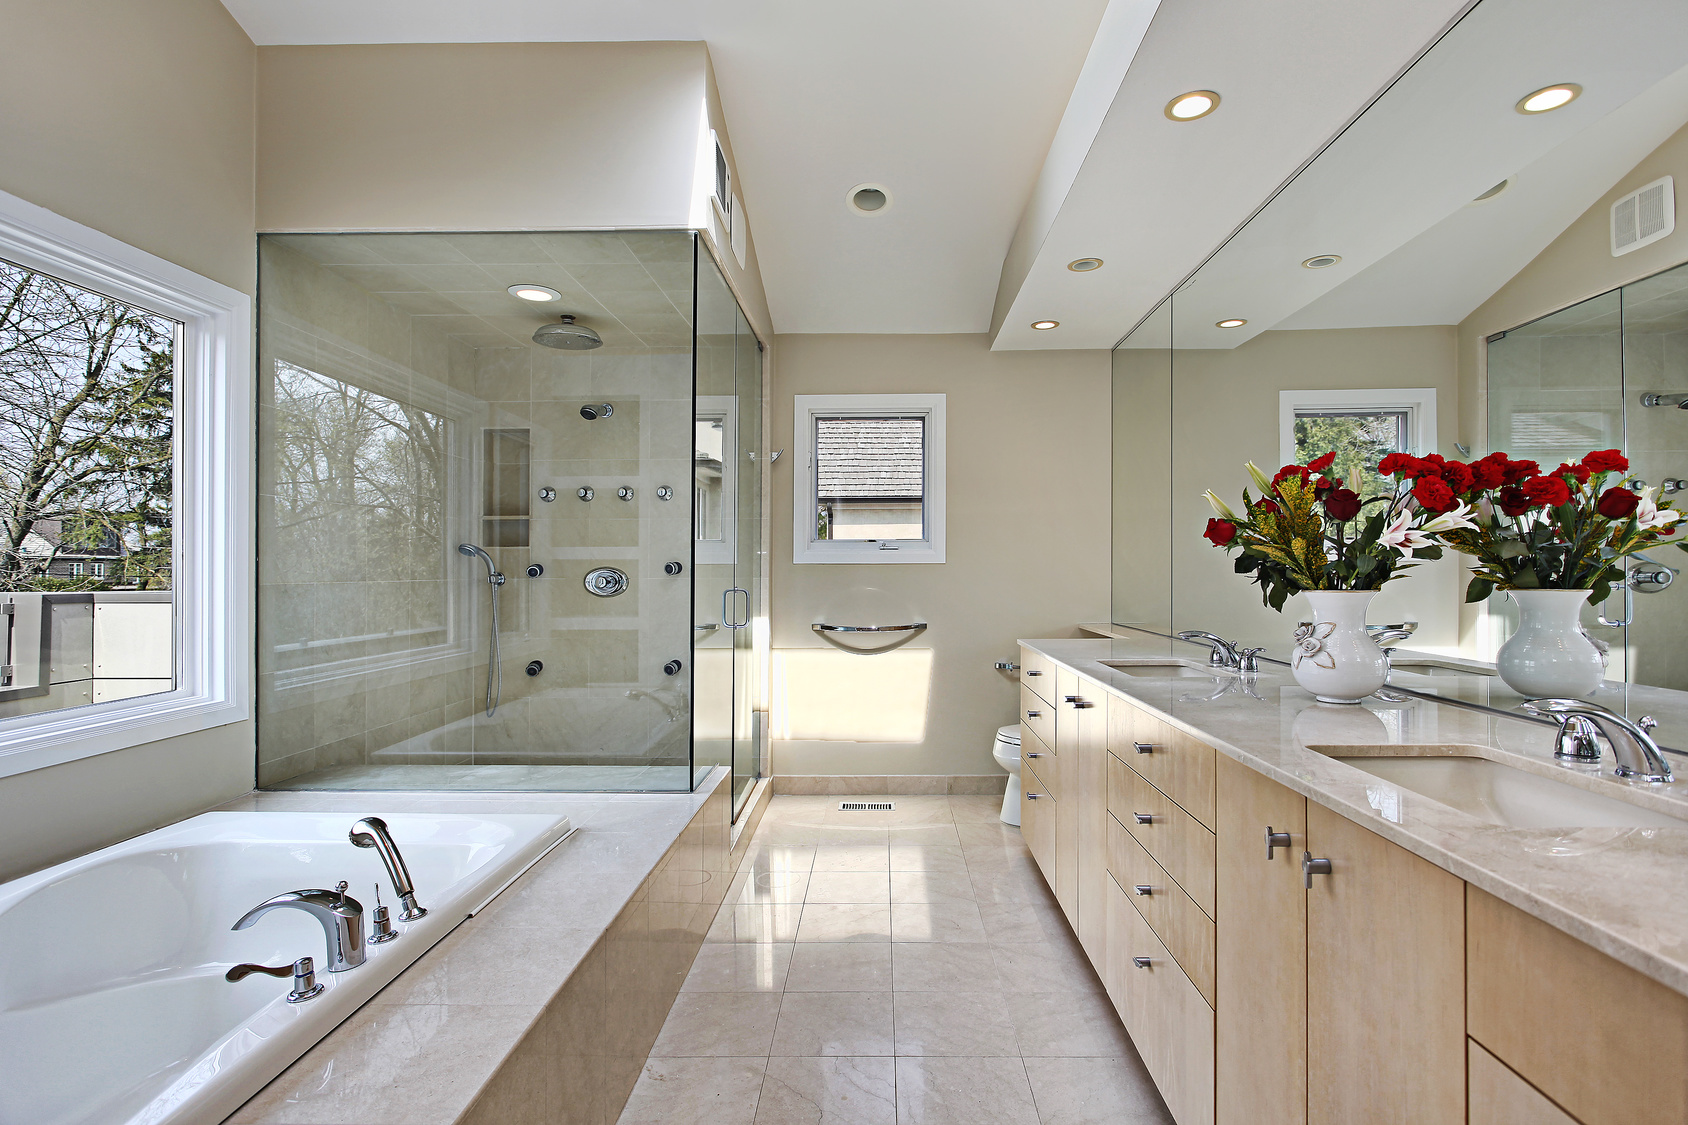 Bathroom tile flooring in Seaside, FL from Coastal Carpet and Tile Carpet One Floor & Home